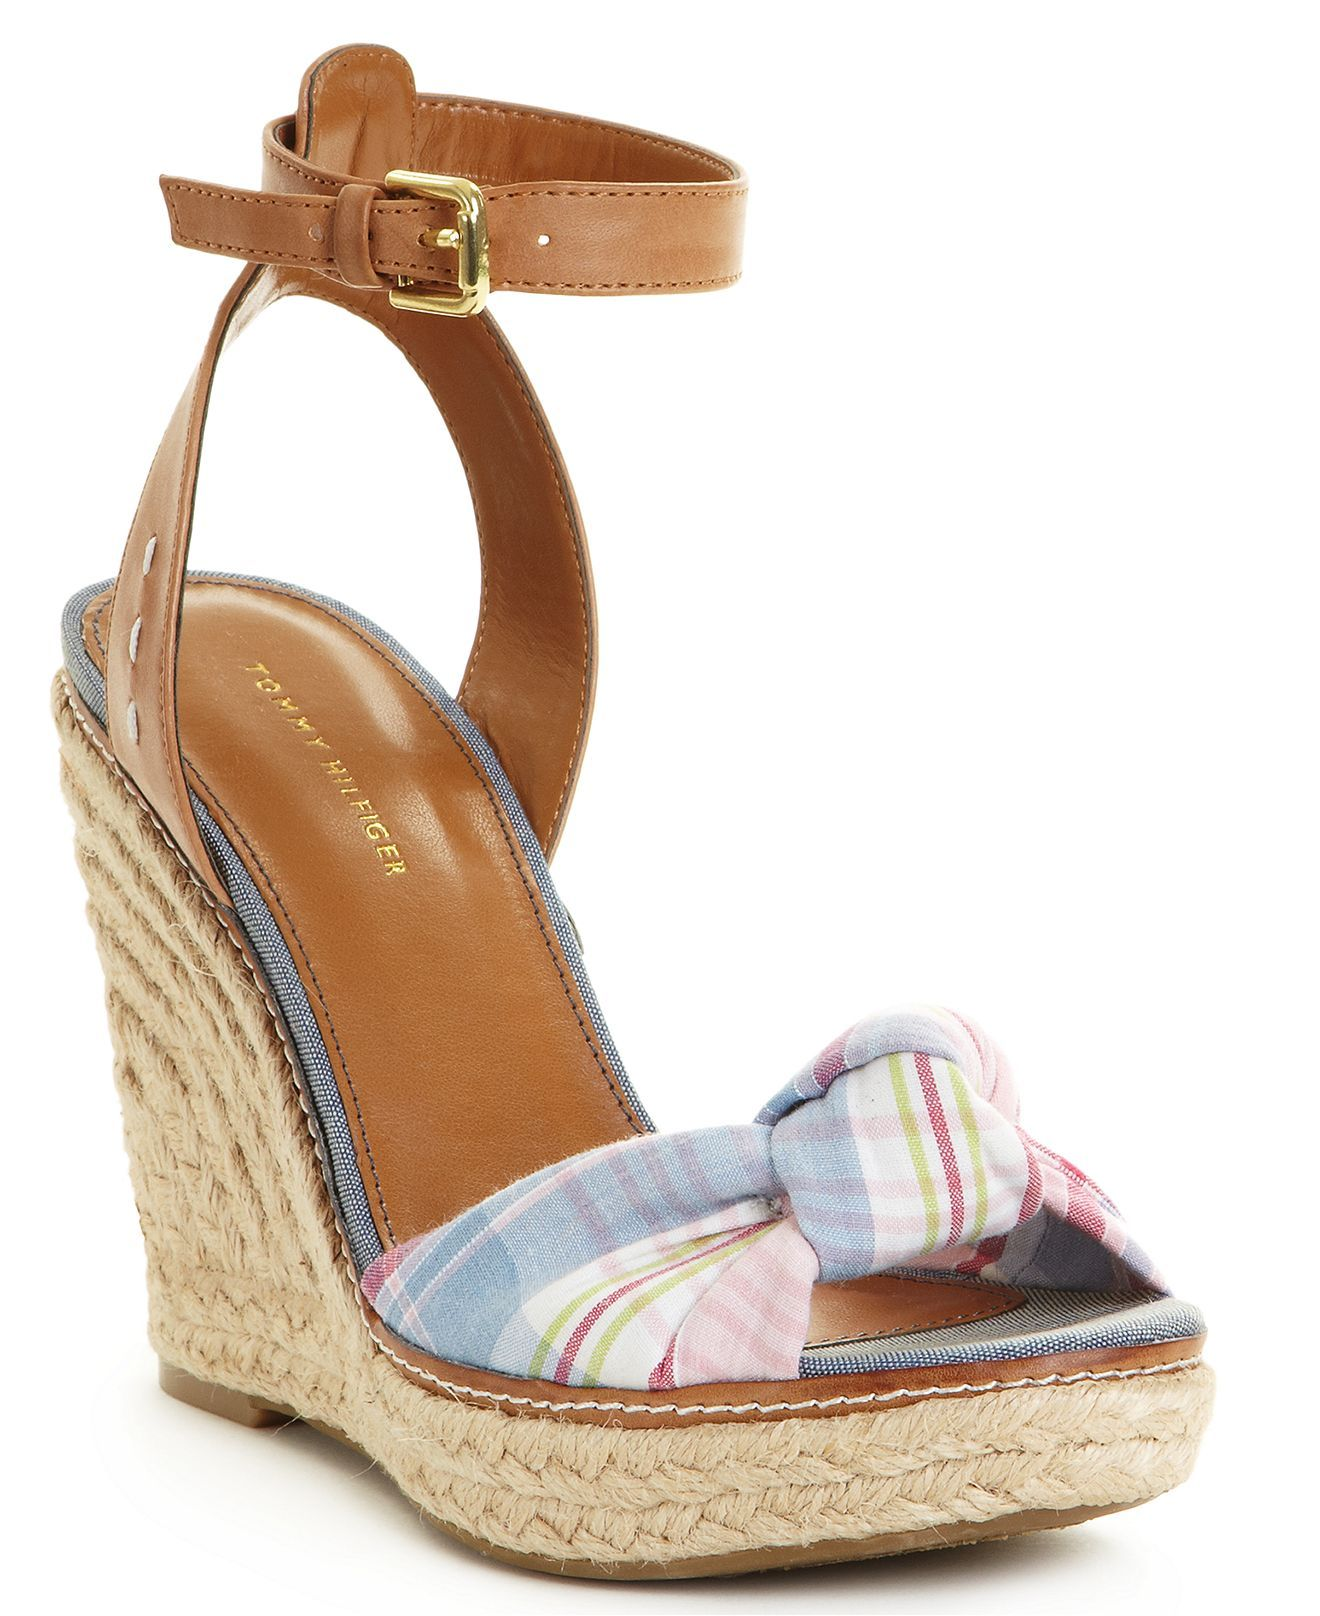 Tommy Hilfiger Veronica Espadrille Wedges - Sandals - Shoes - Macy's